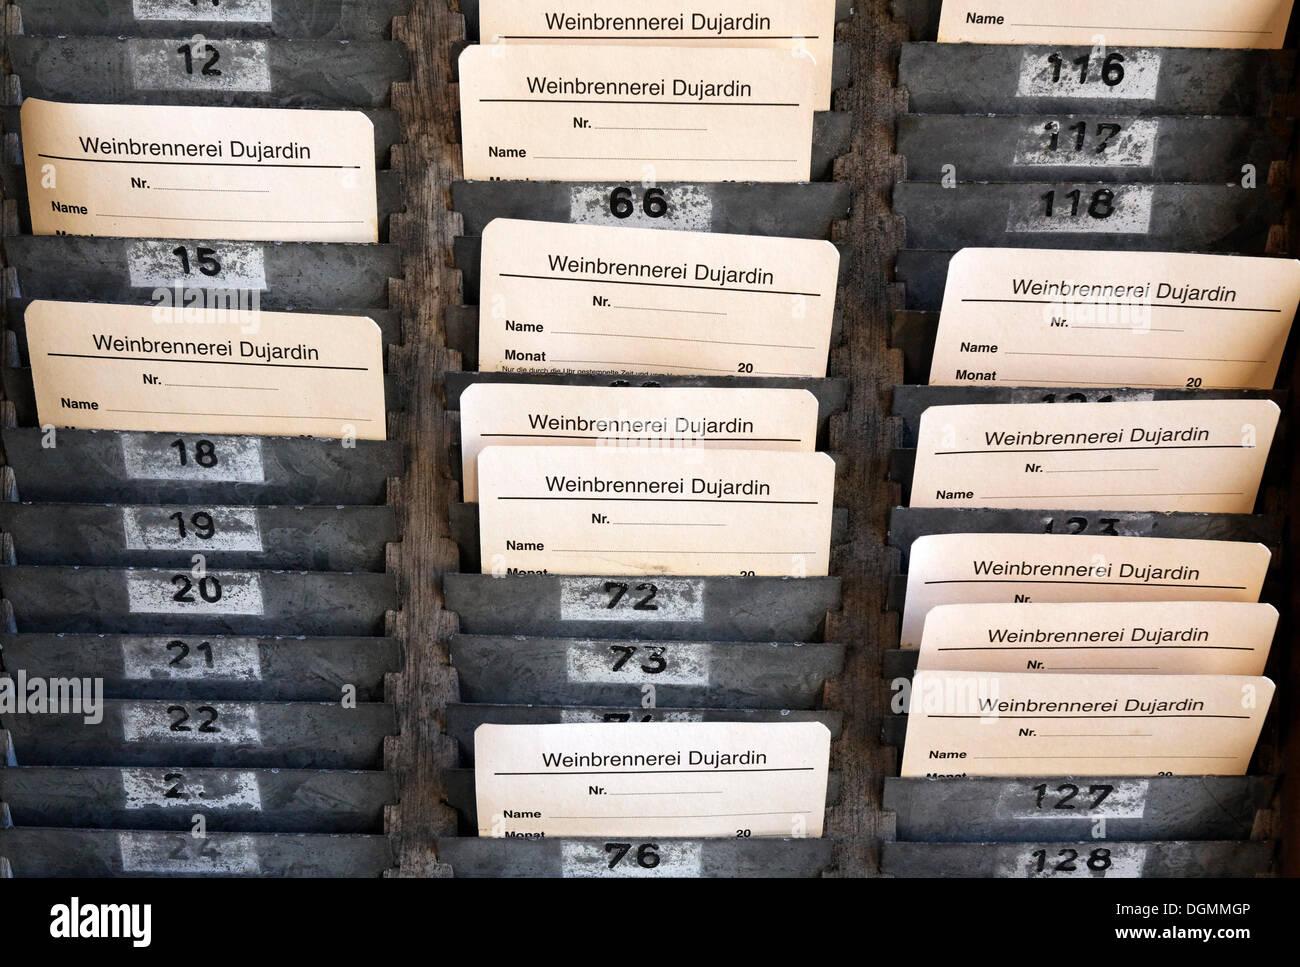 Board with time-stamped cards, time-punch machine, former Dujardin distillery, Krefeld-Uerdingen, North Rhine-Westphalia - Stock Image